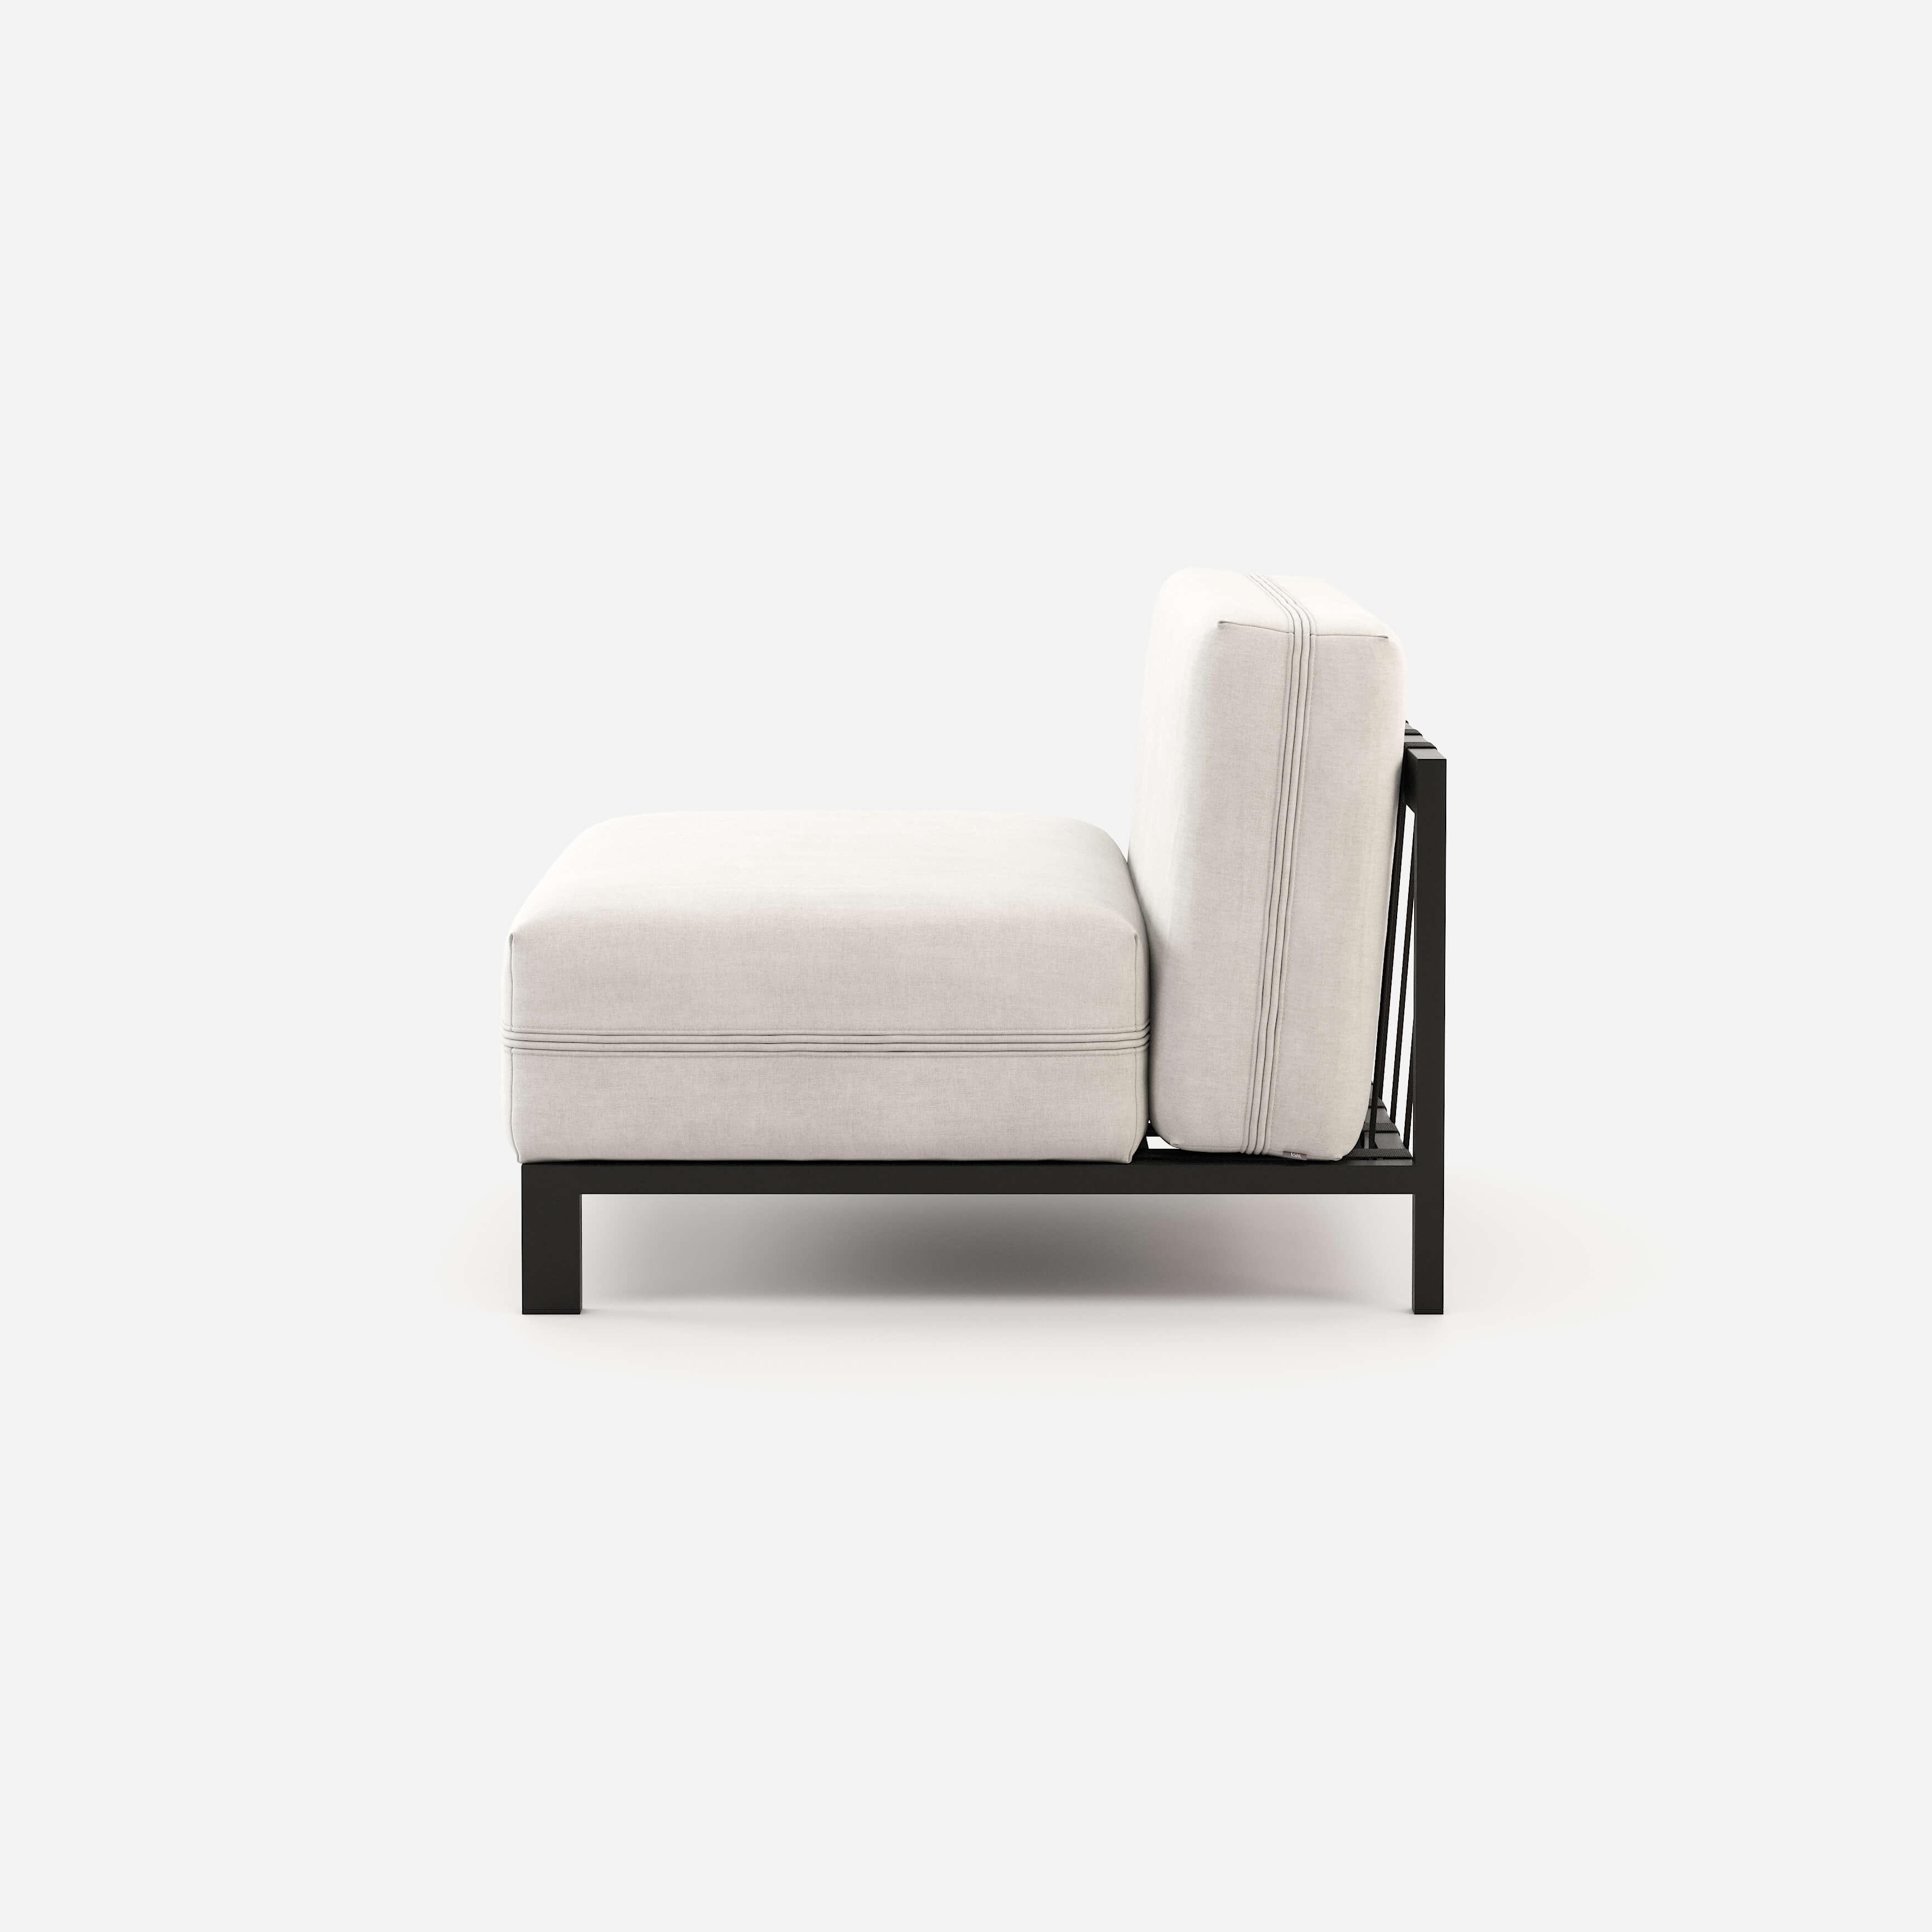 Bondi Middle Sofa-interior-design-home-decor-furniture-white-domkapa-upholstery-3